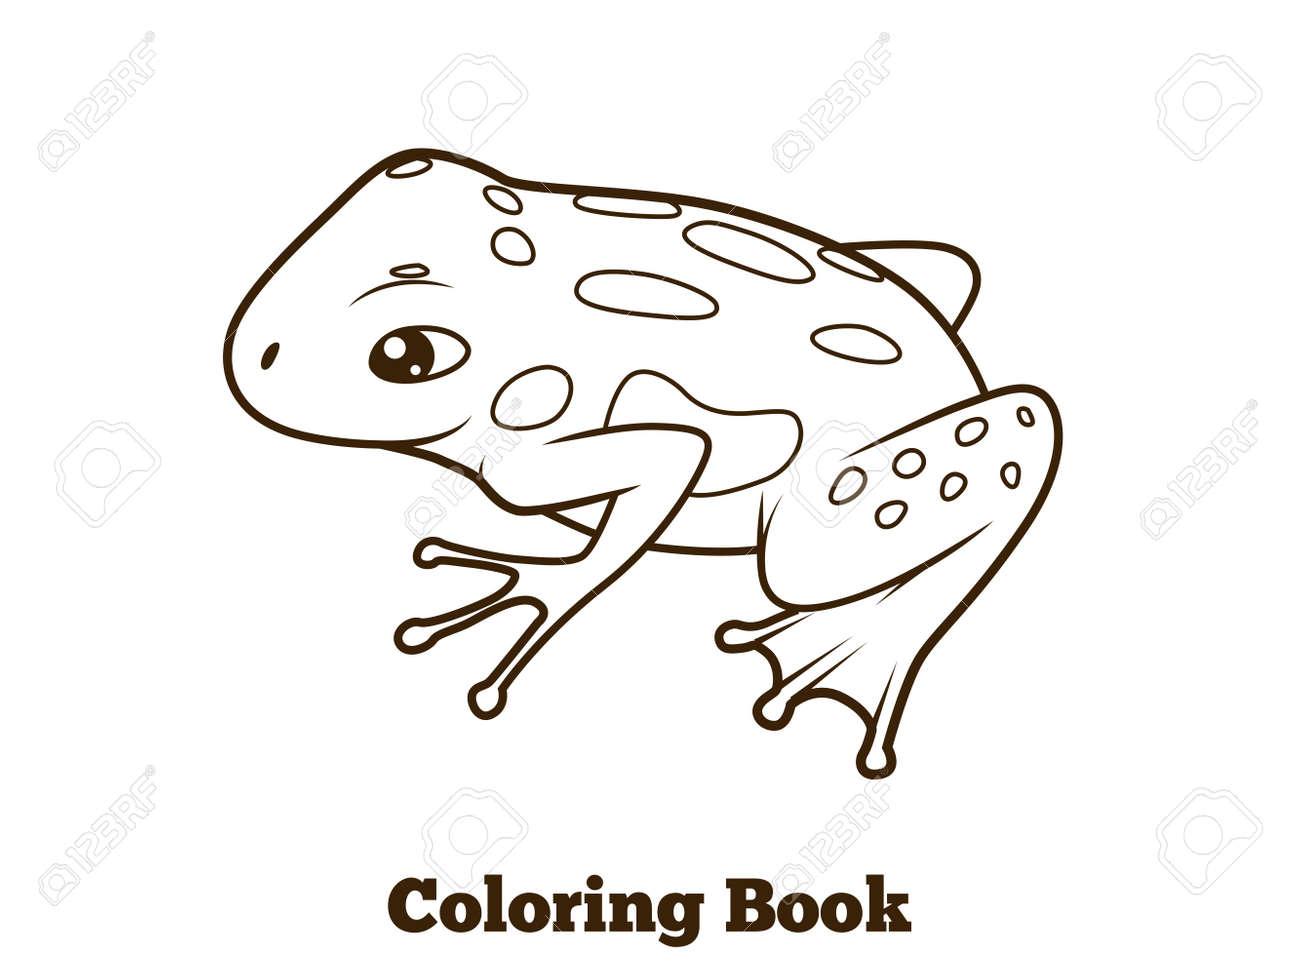 Rana Libro Para Colorear De Dibujos Animados A Mano Ilustración